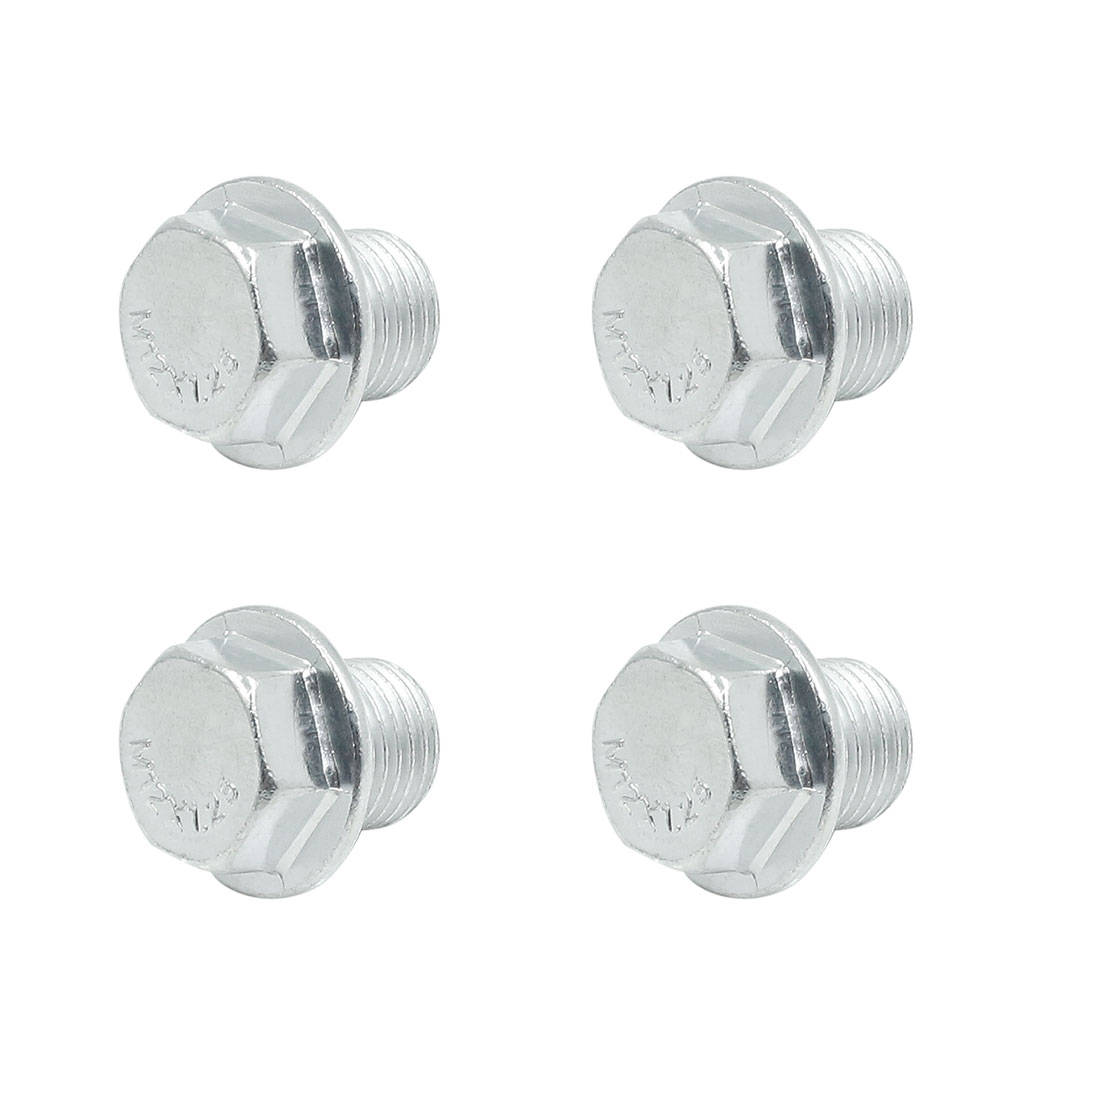 4pcs 20 x 19mm Auto Car Silver Tone Magnetic Engine Oil Pan Drain Plug Bolt